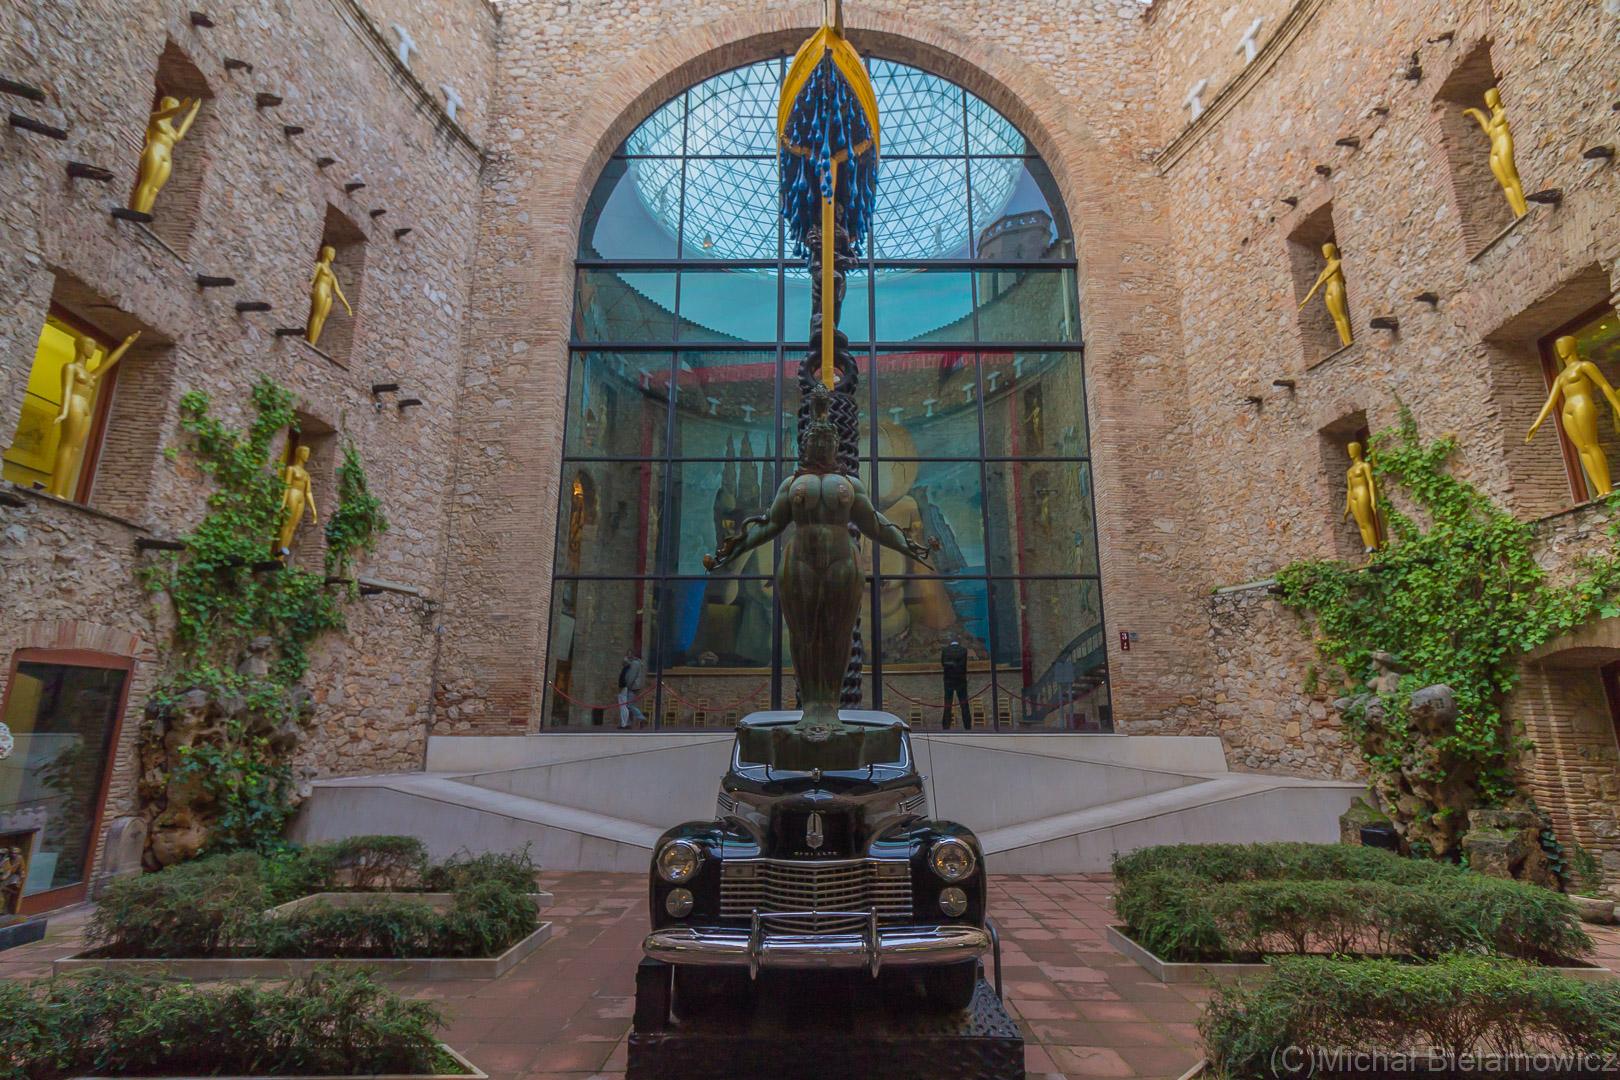 Muzeum Salvadora Dali - Teatro-Museu Dalí de Figueres